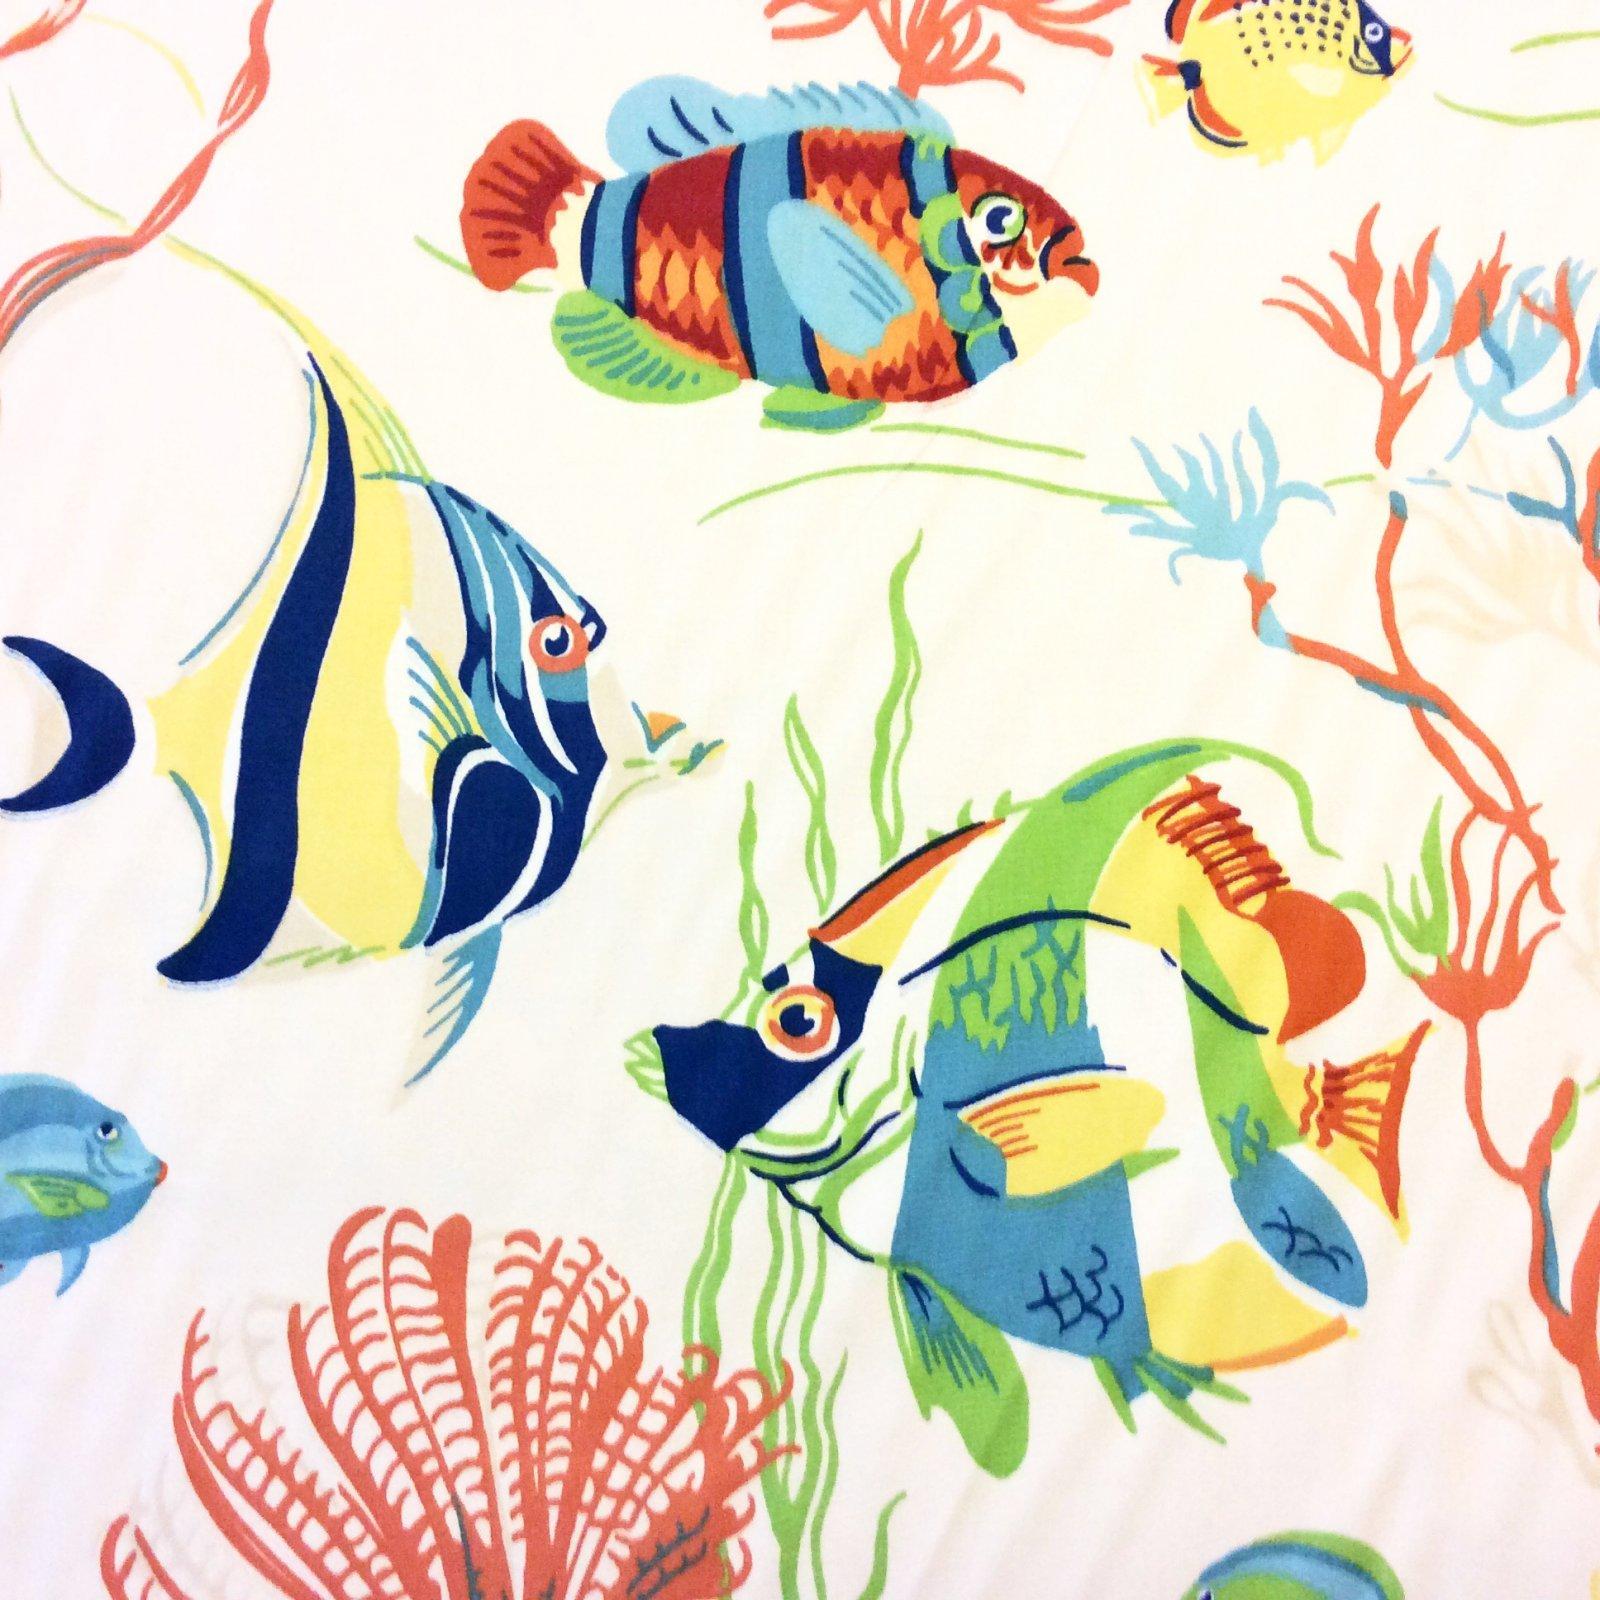 Sea Life Delmar Ocean Shells Lobster Crab Lionfish Shrimp Fish Heavy Weight Cotton Fabric Drapery Fabric DSO305